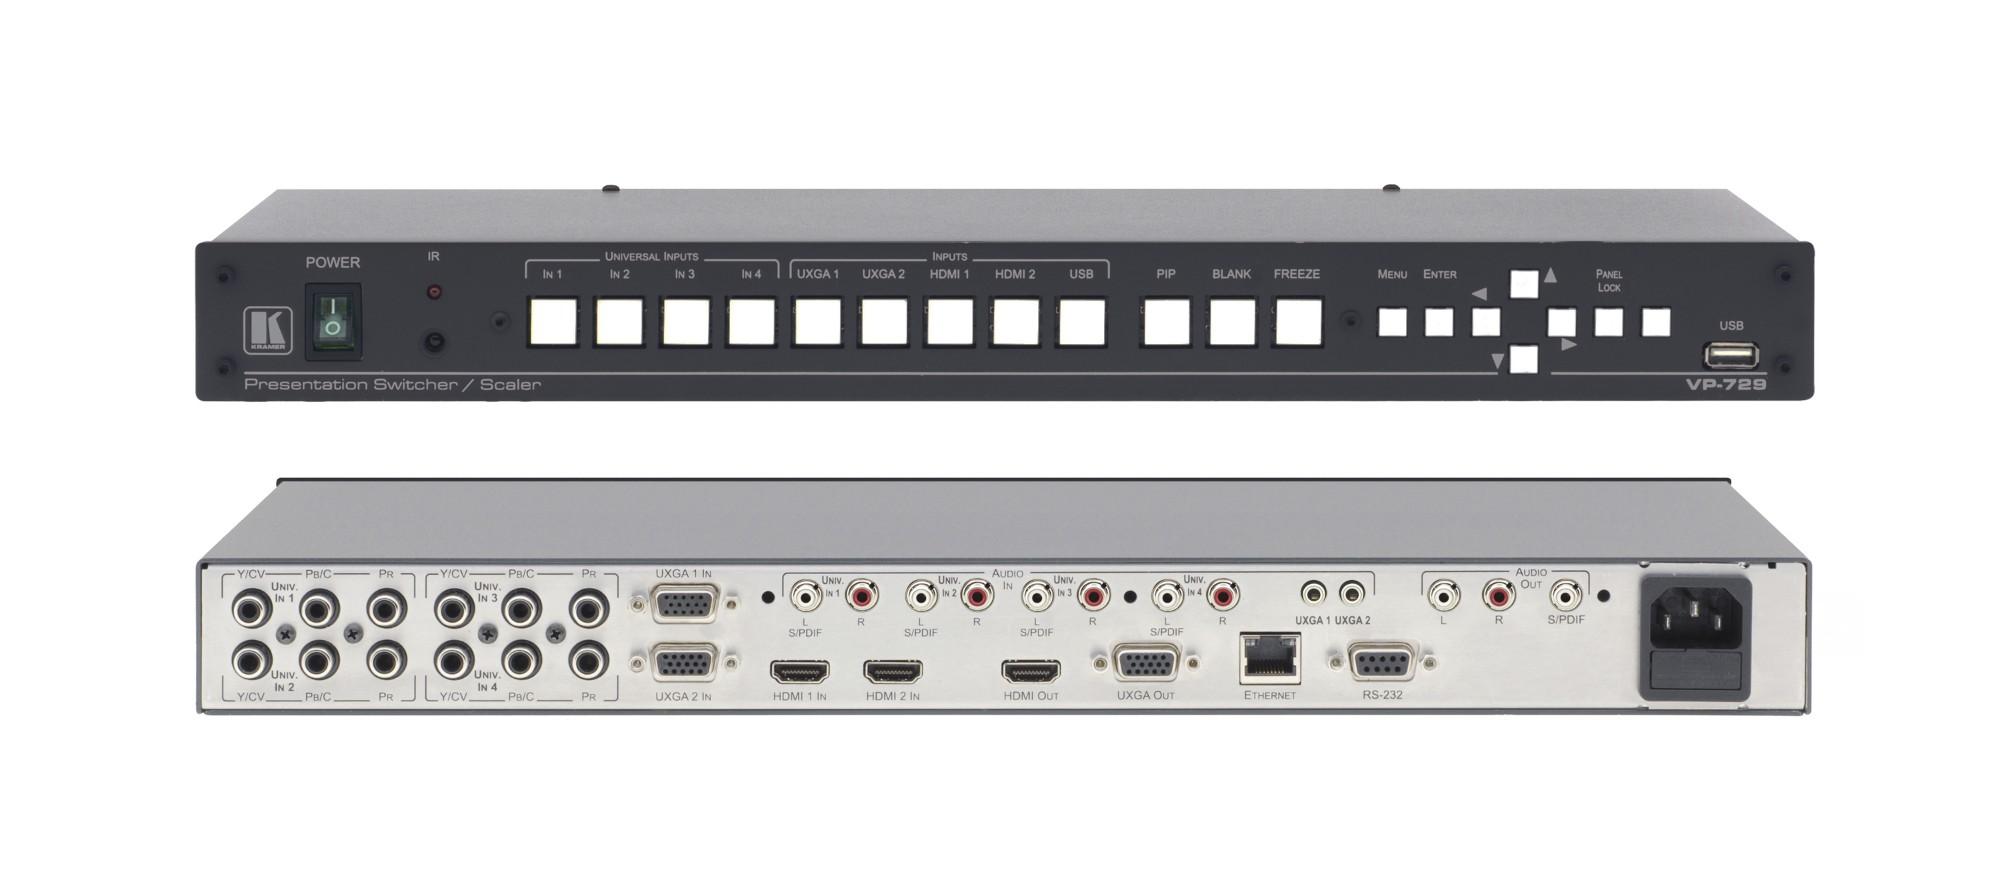 Kramer Electronics VP-729 video switch